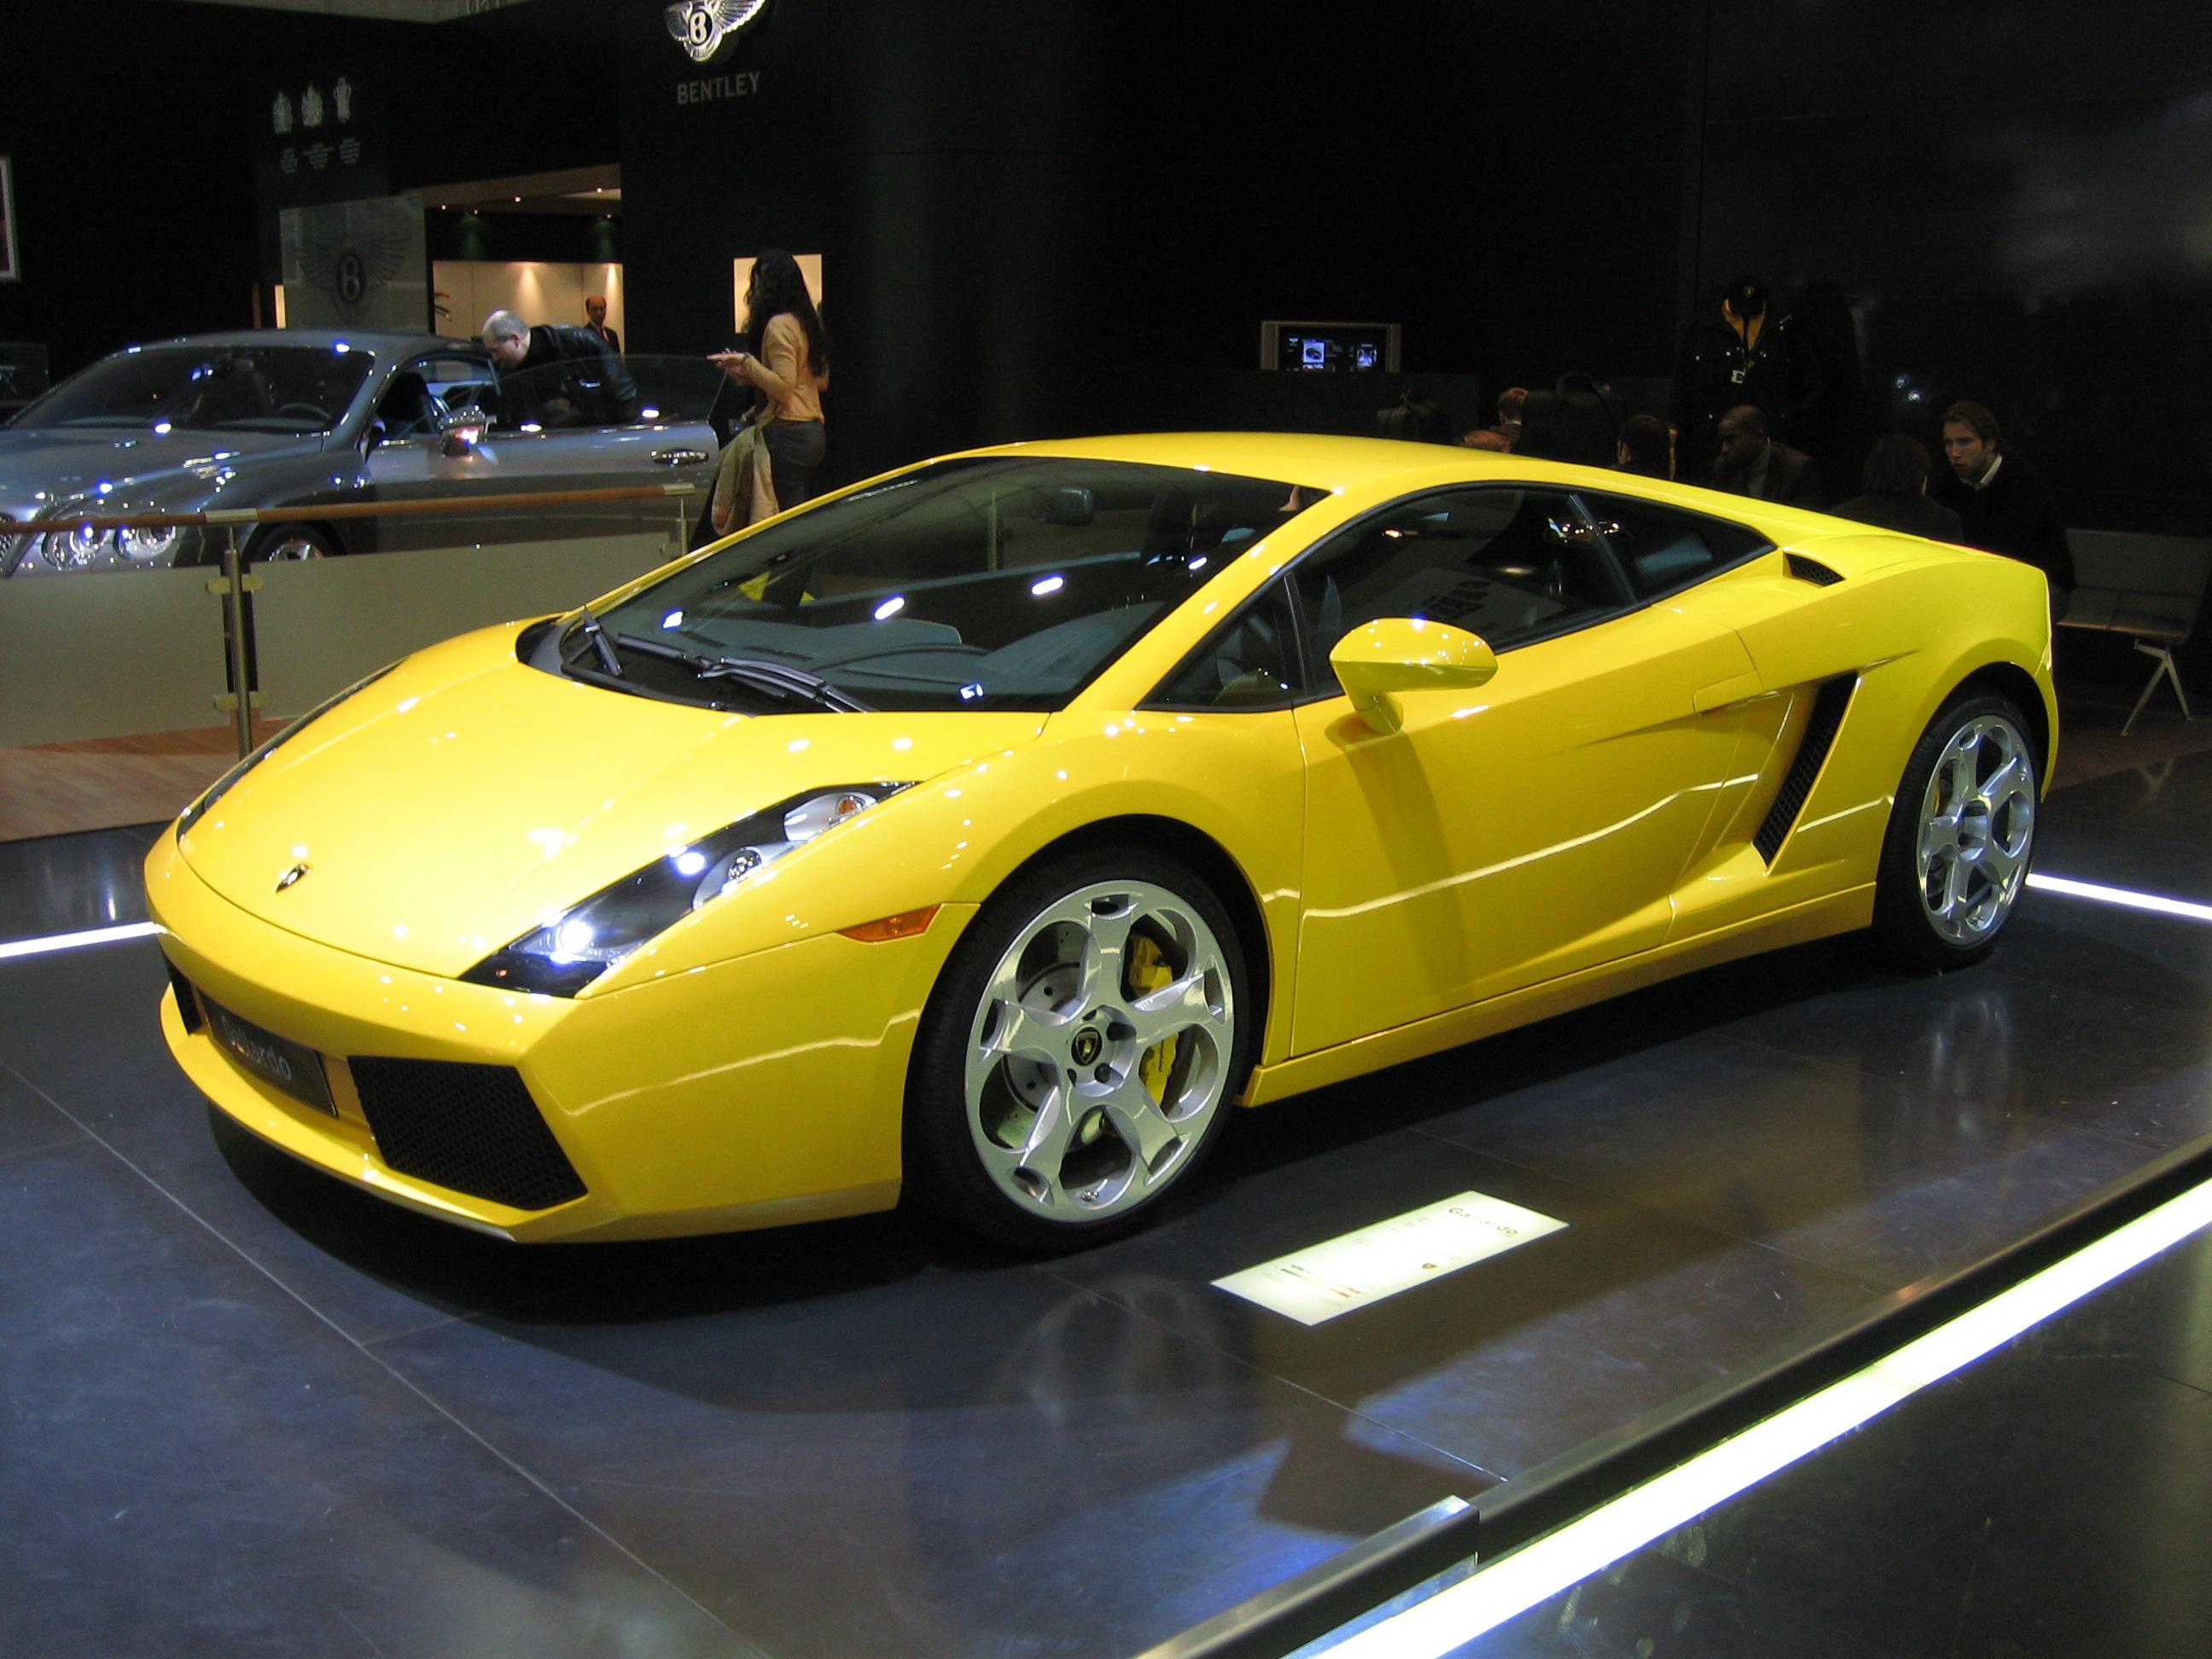 HQ Lamborghini Gallardo Wallpapers   File 1072.07Kb